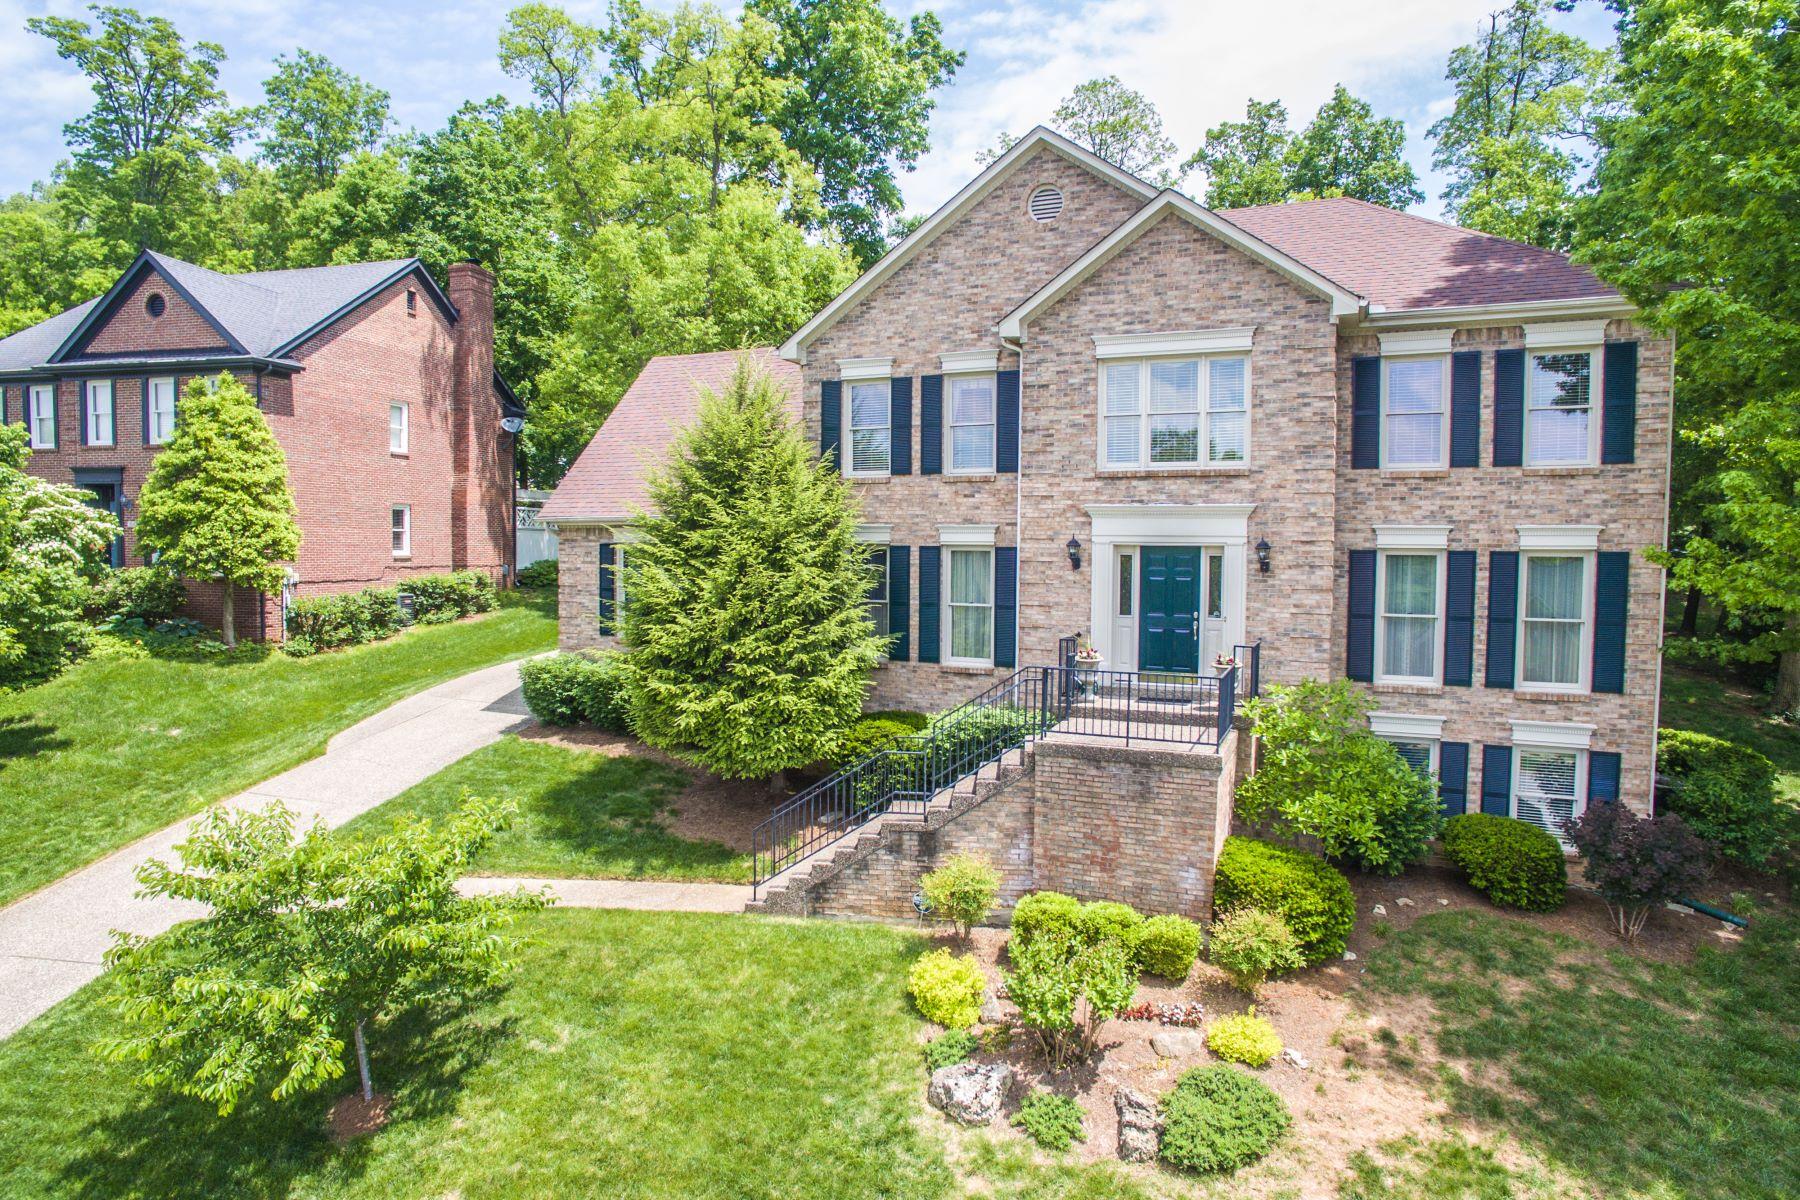 Villa per Vendita alle ore 10420 Worthington Lane Prospect, Kentucky, 40059 Stati Uniti